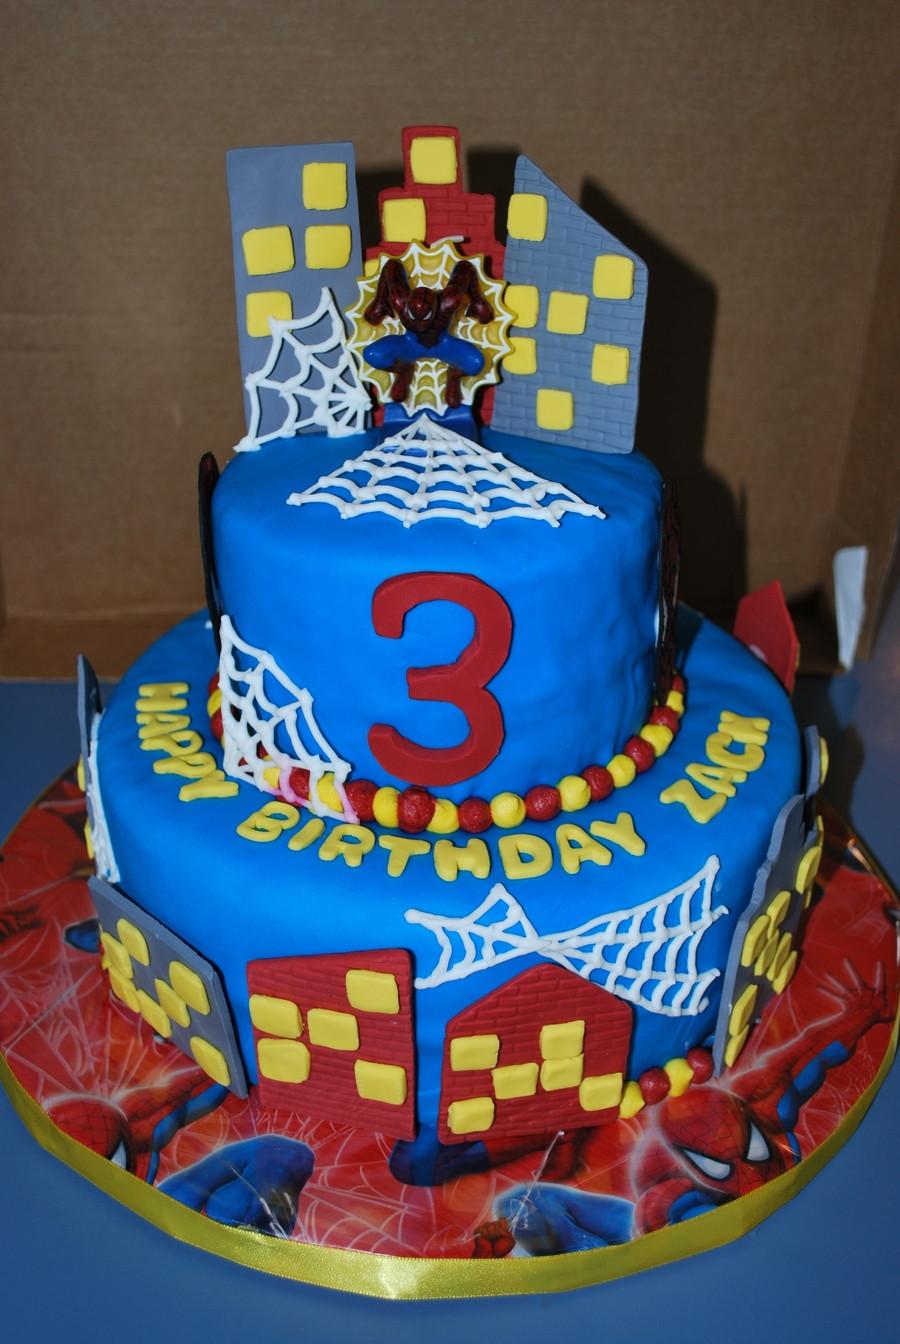 Spiderman Birthday Cakes  Spiderman 3Rd Birthday Cake CakeCentral